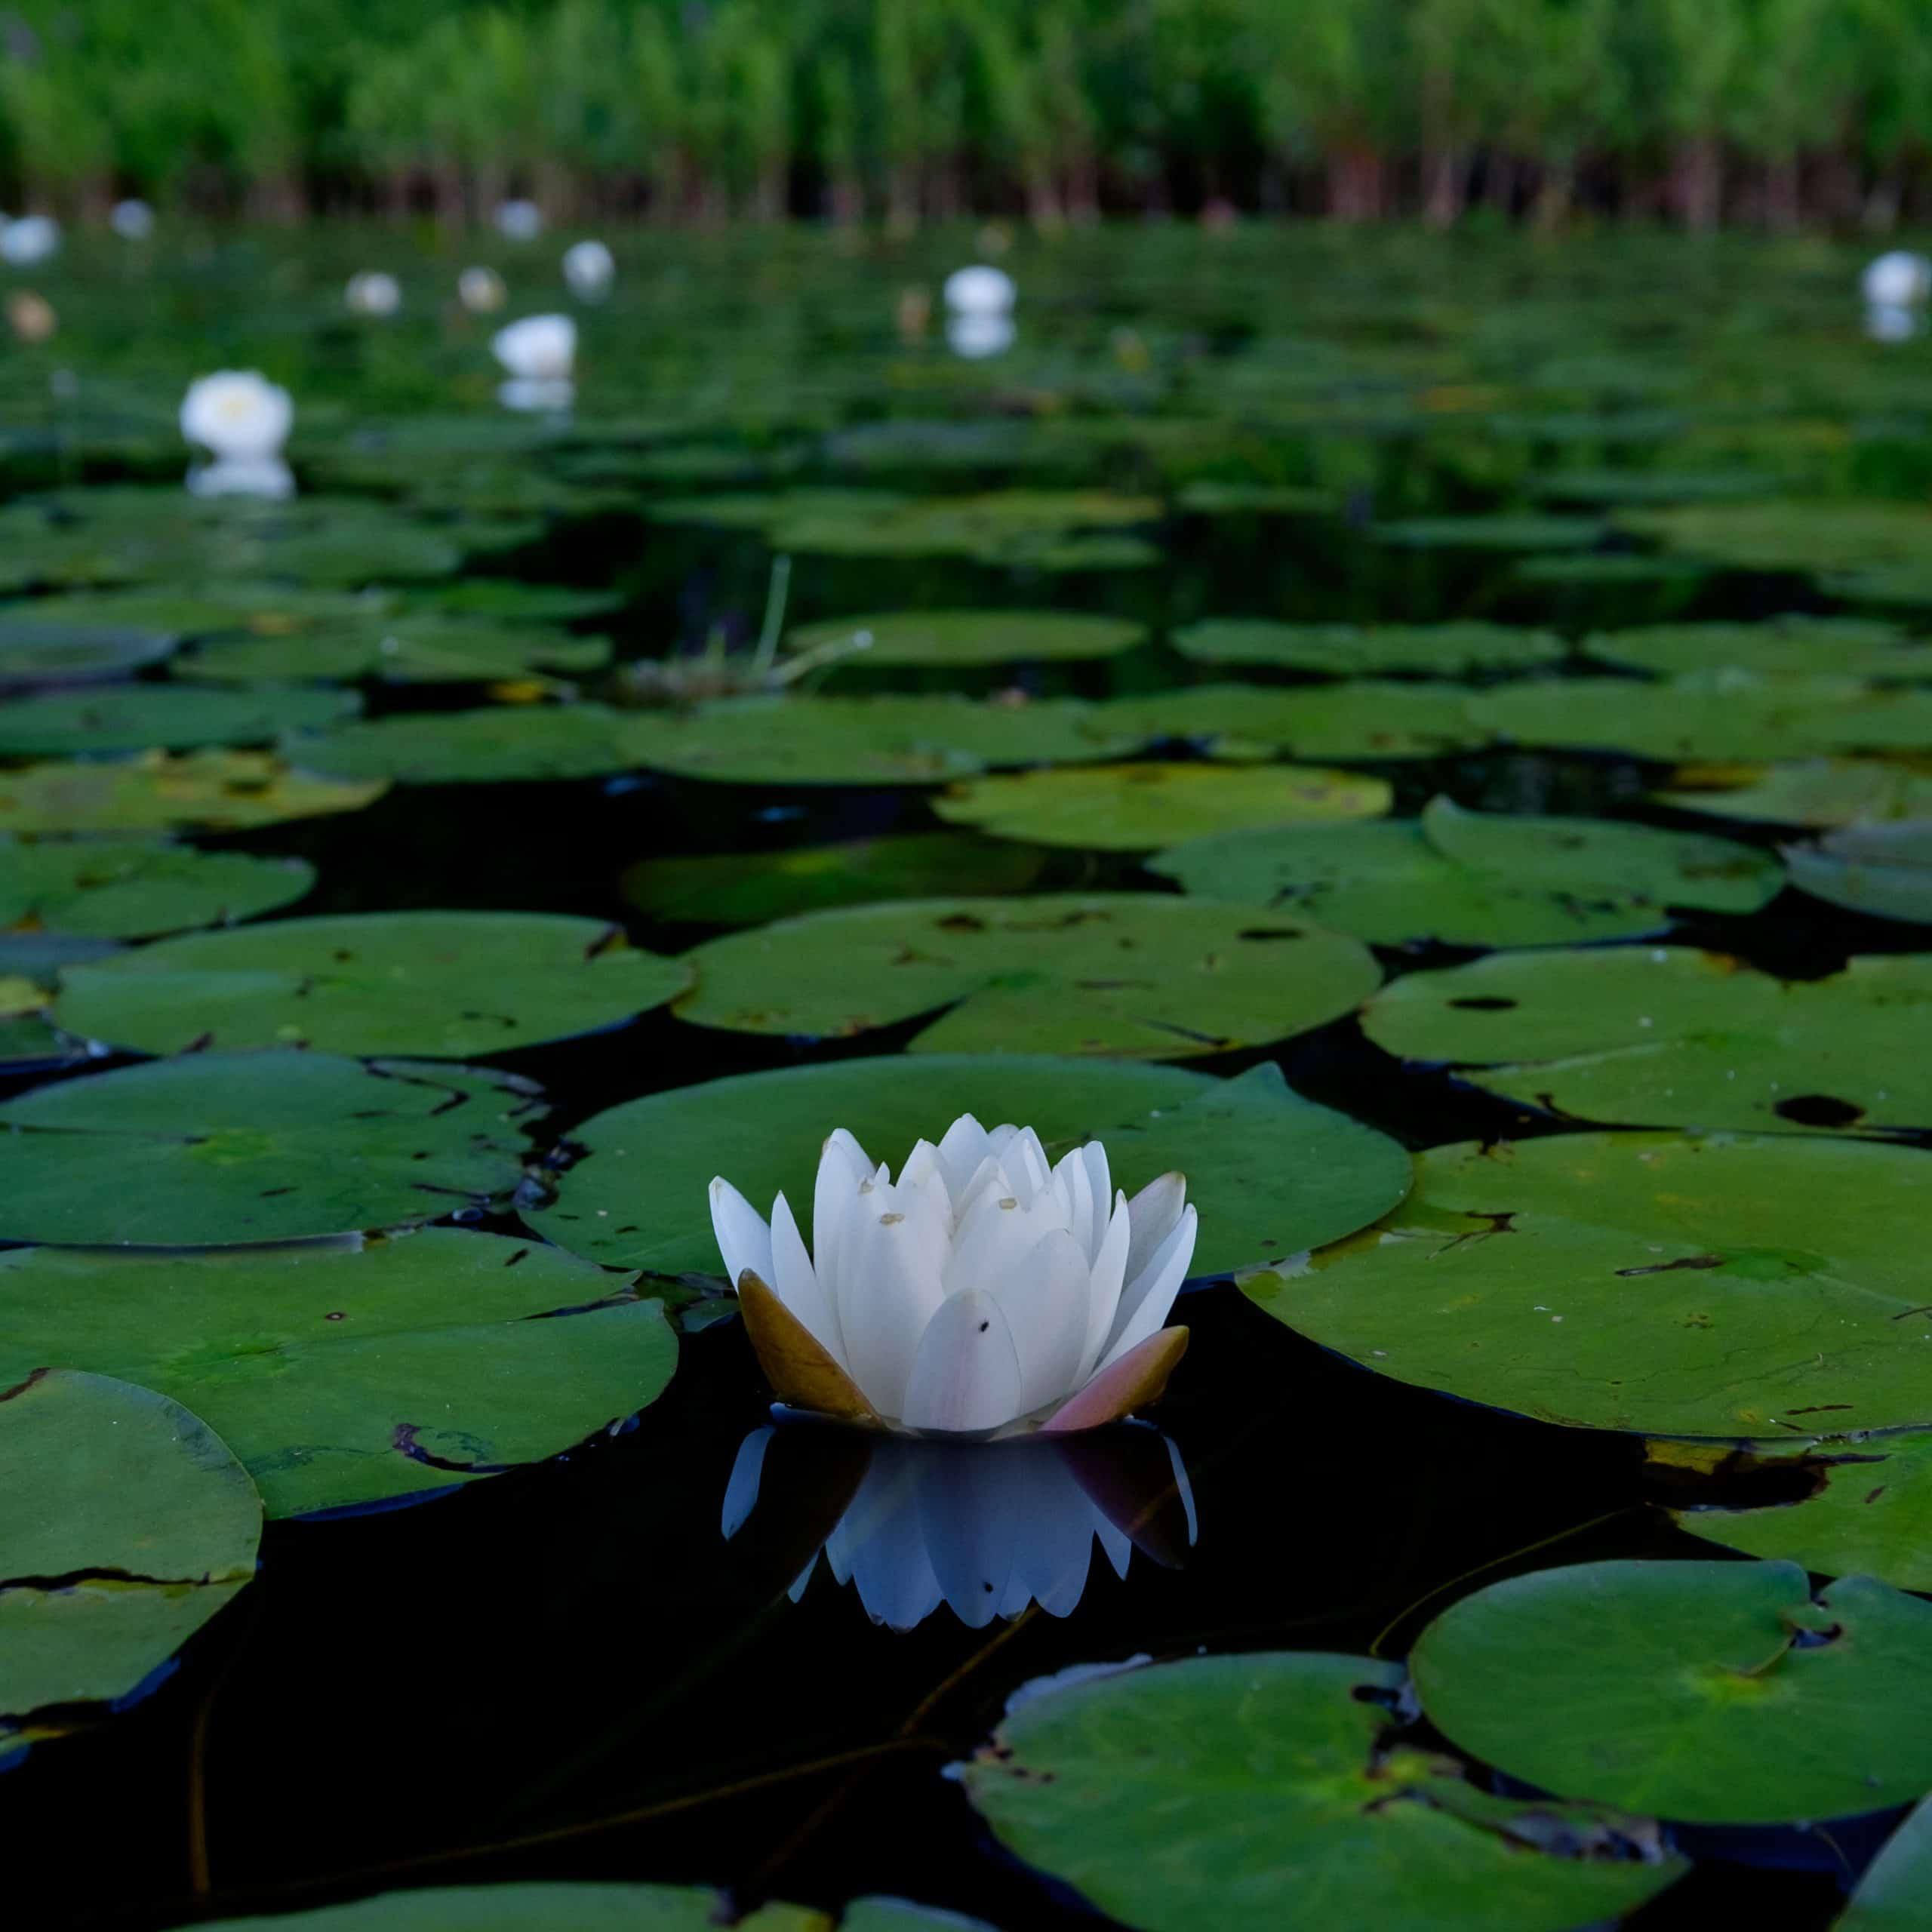 ponkapoag water lily